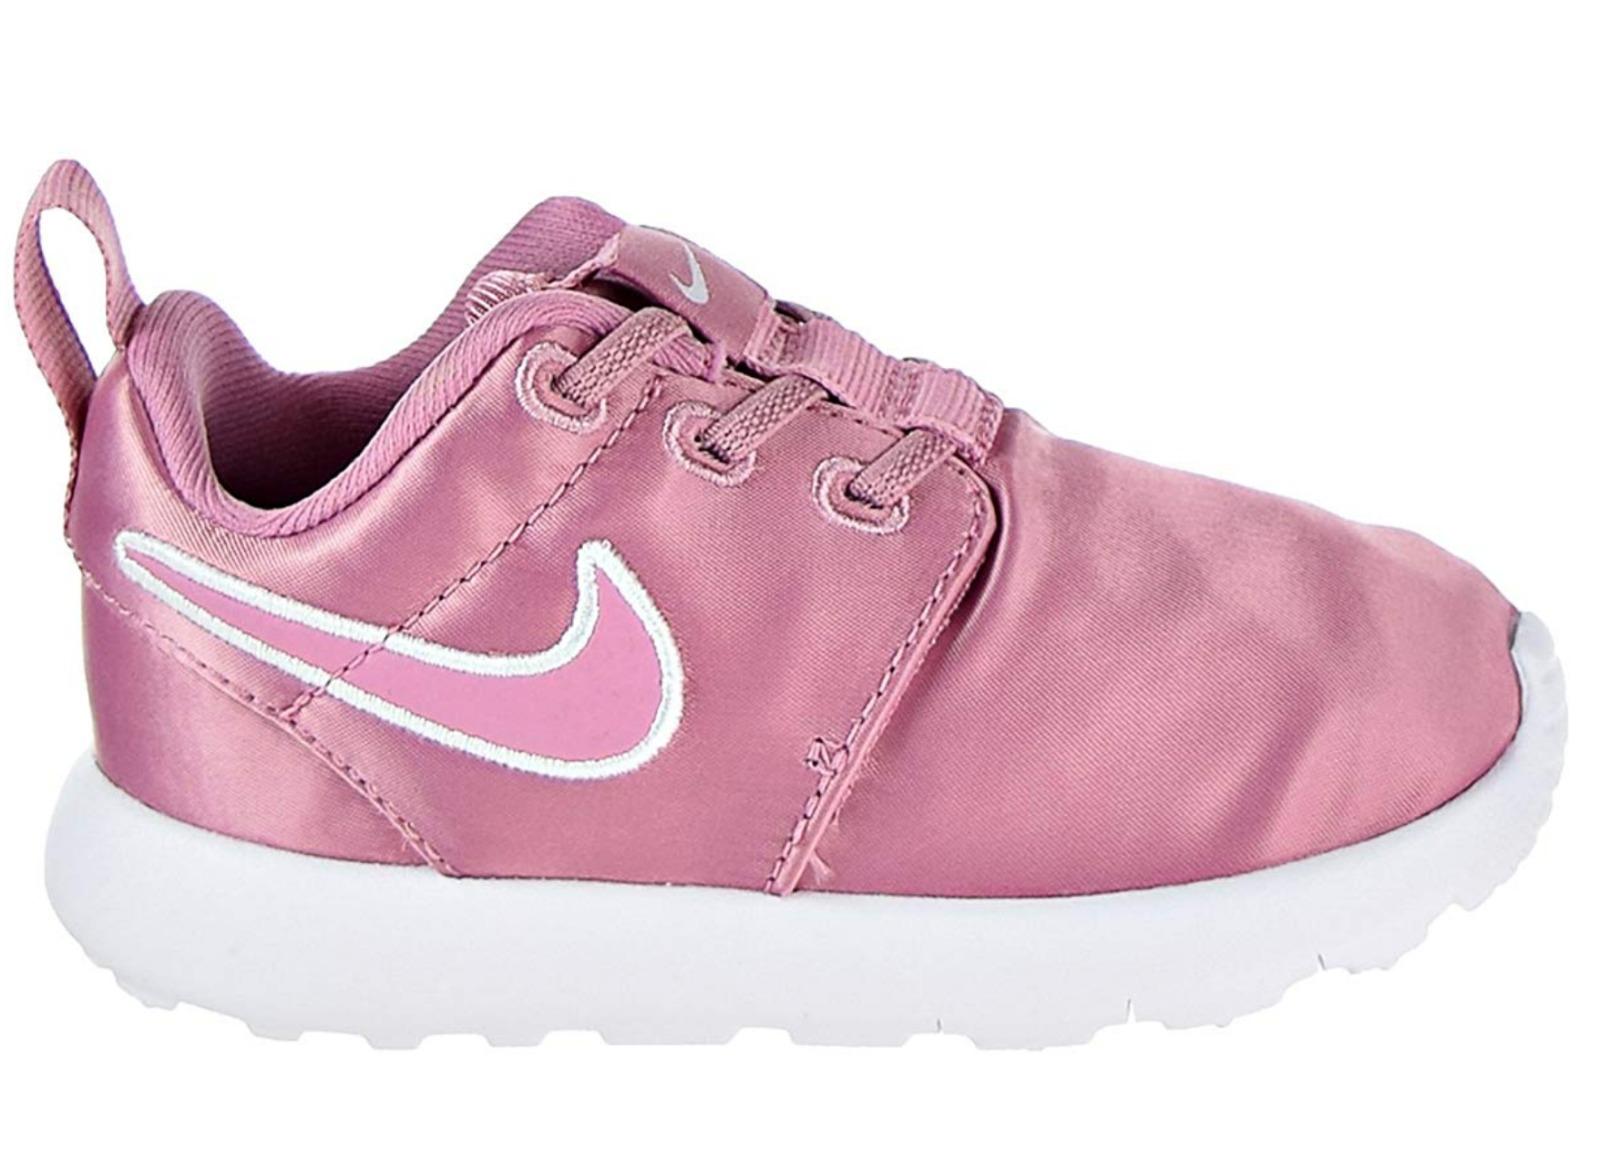 Nike Roshe One Toddler's Shoes